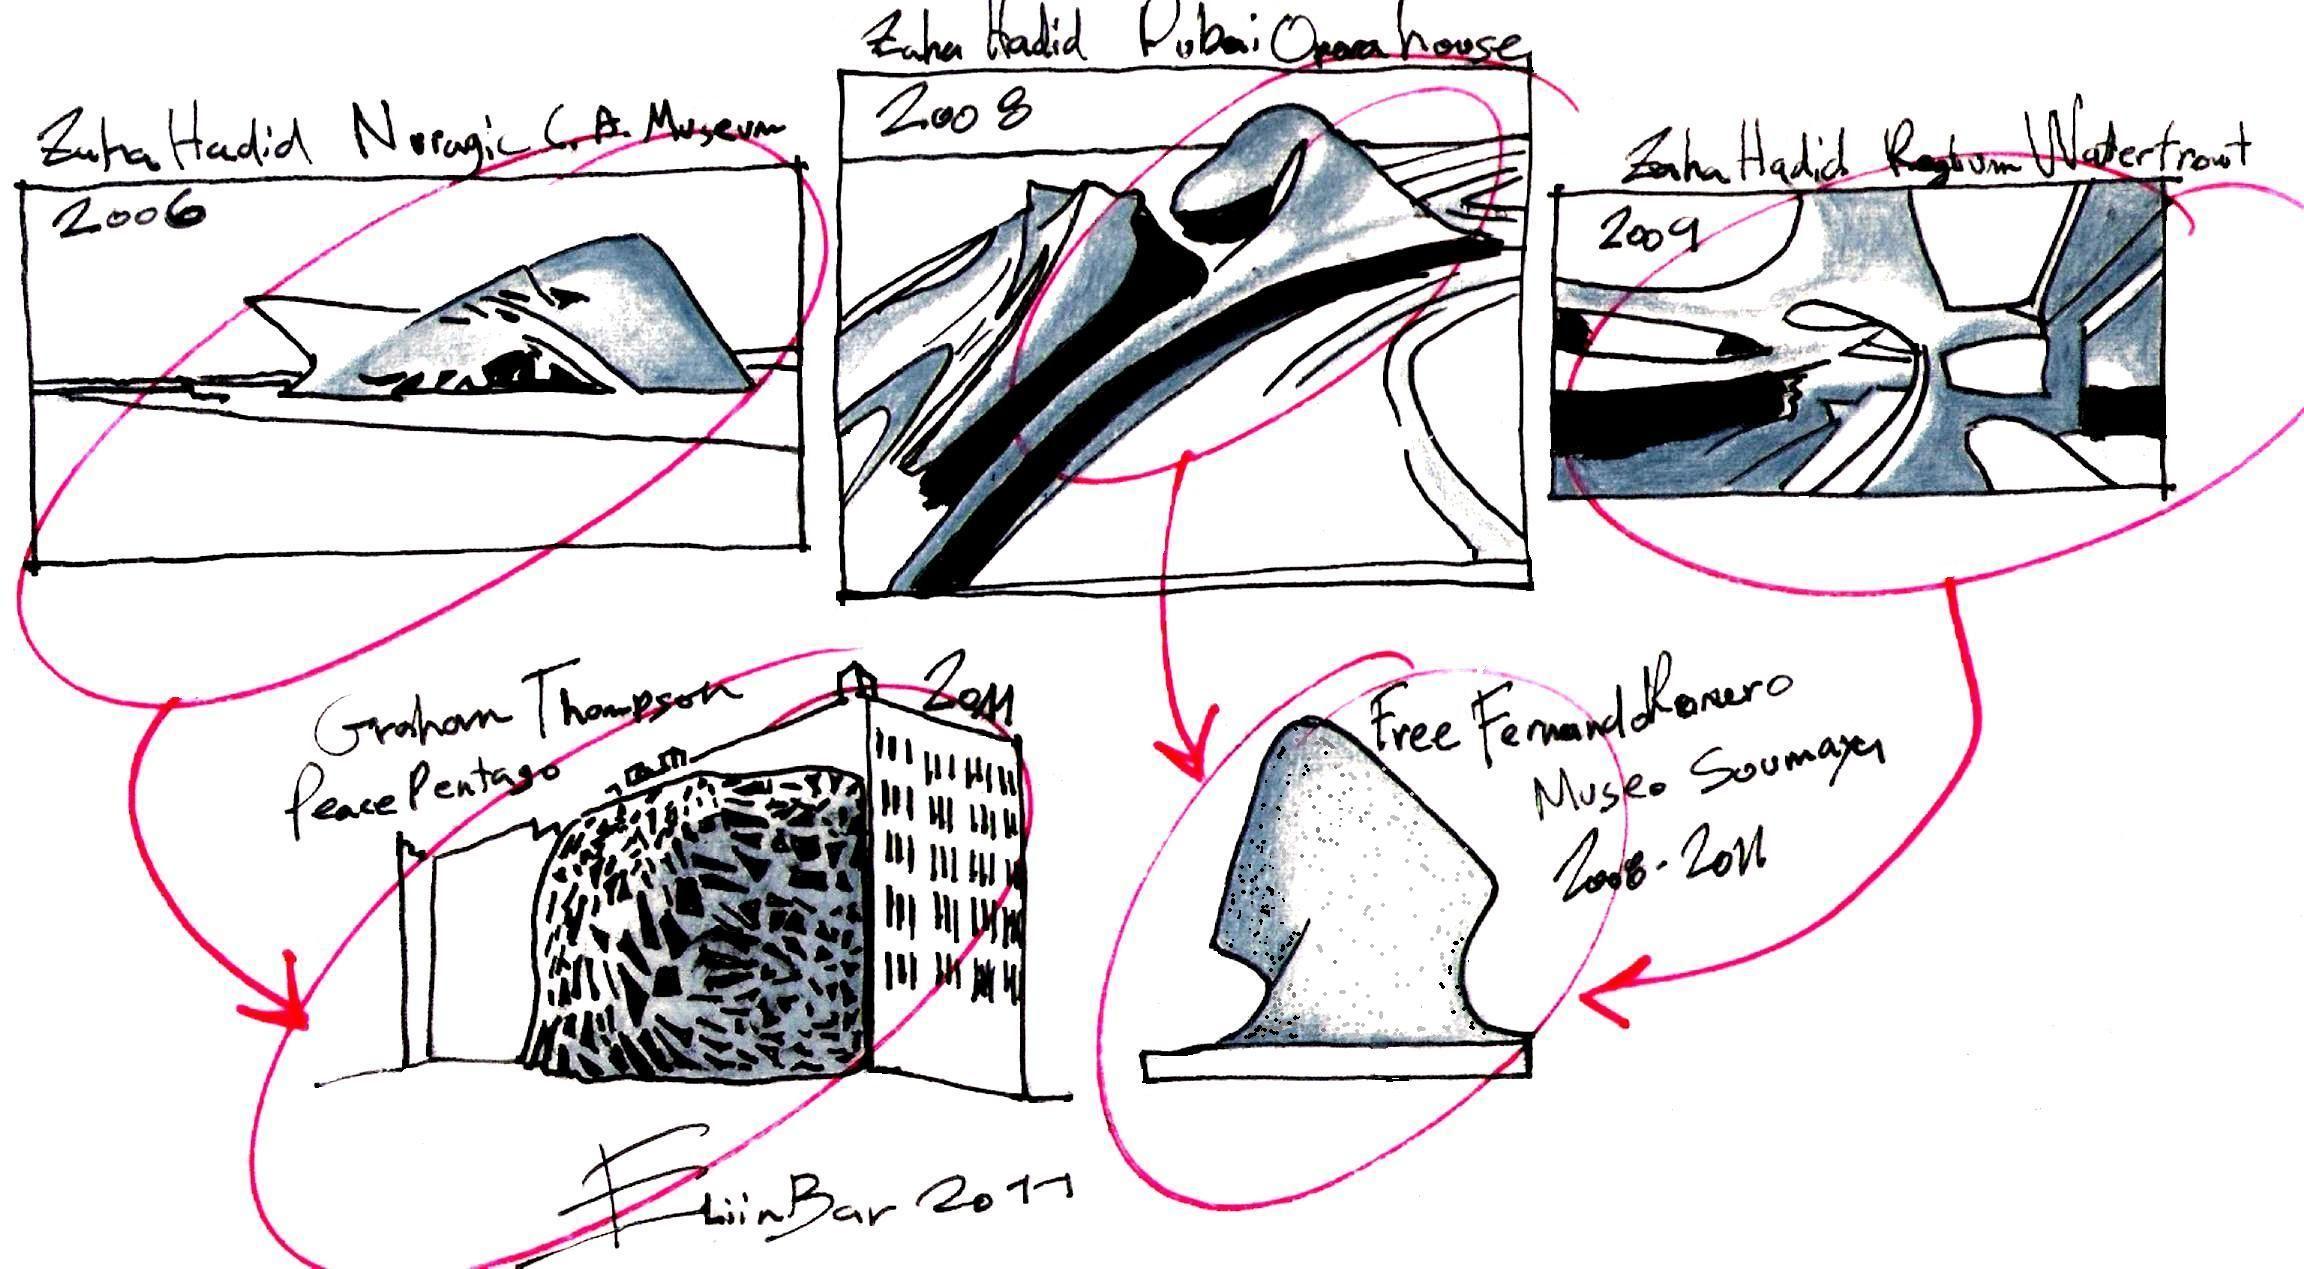 Zaha Hadid Design Concepts And Theory zaha hadid sketches #hadid #zaha pinnedwww.modlar | zaha